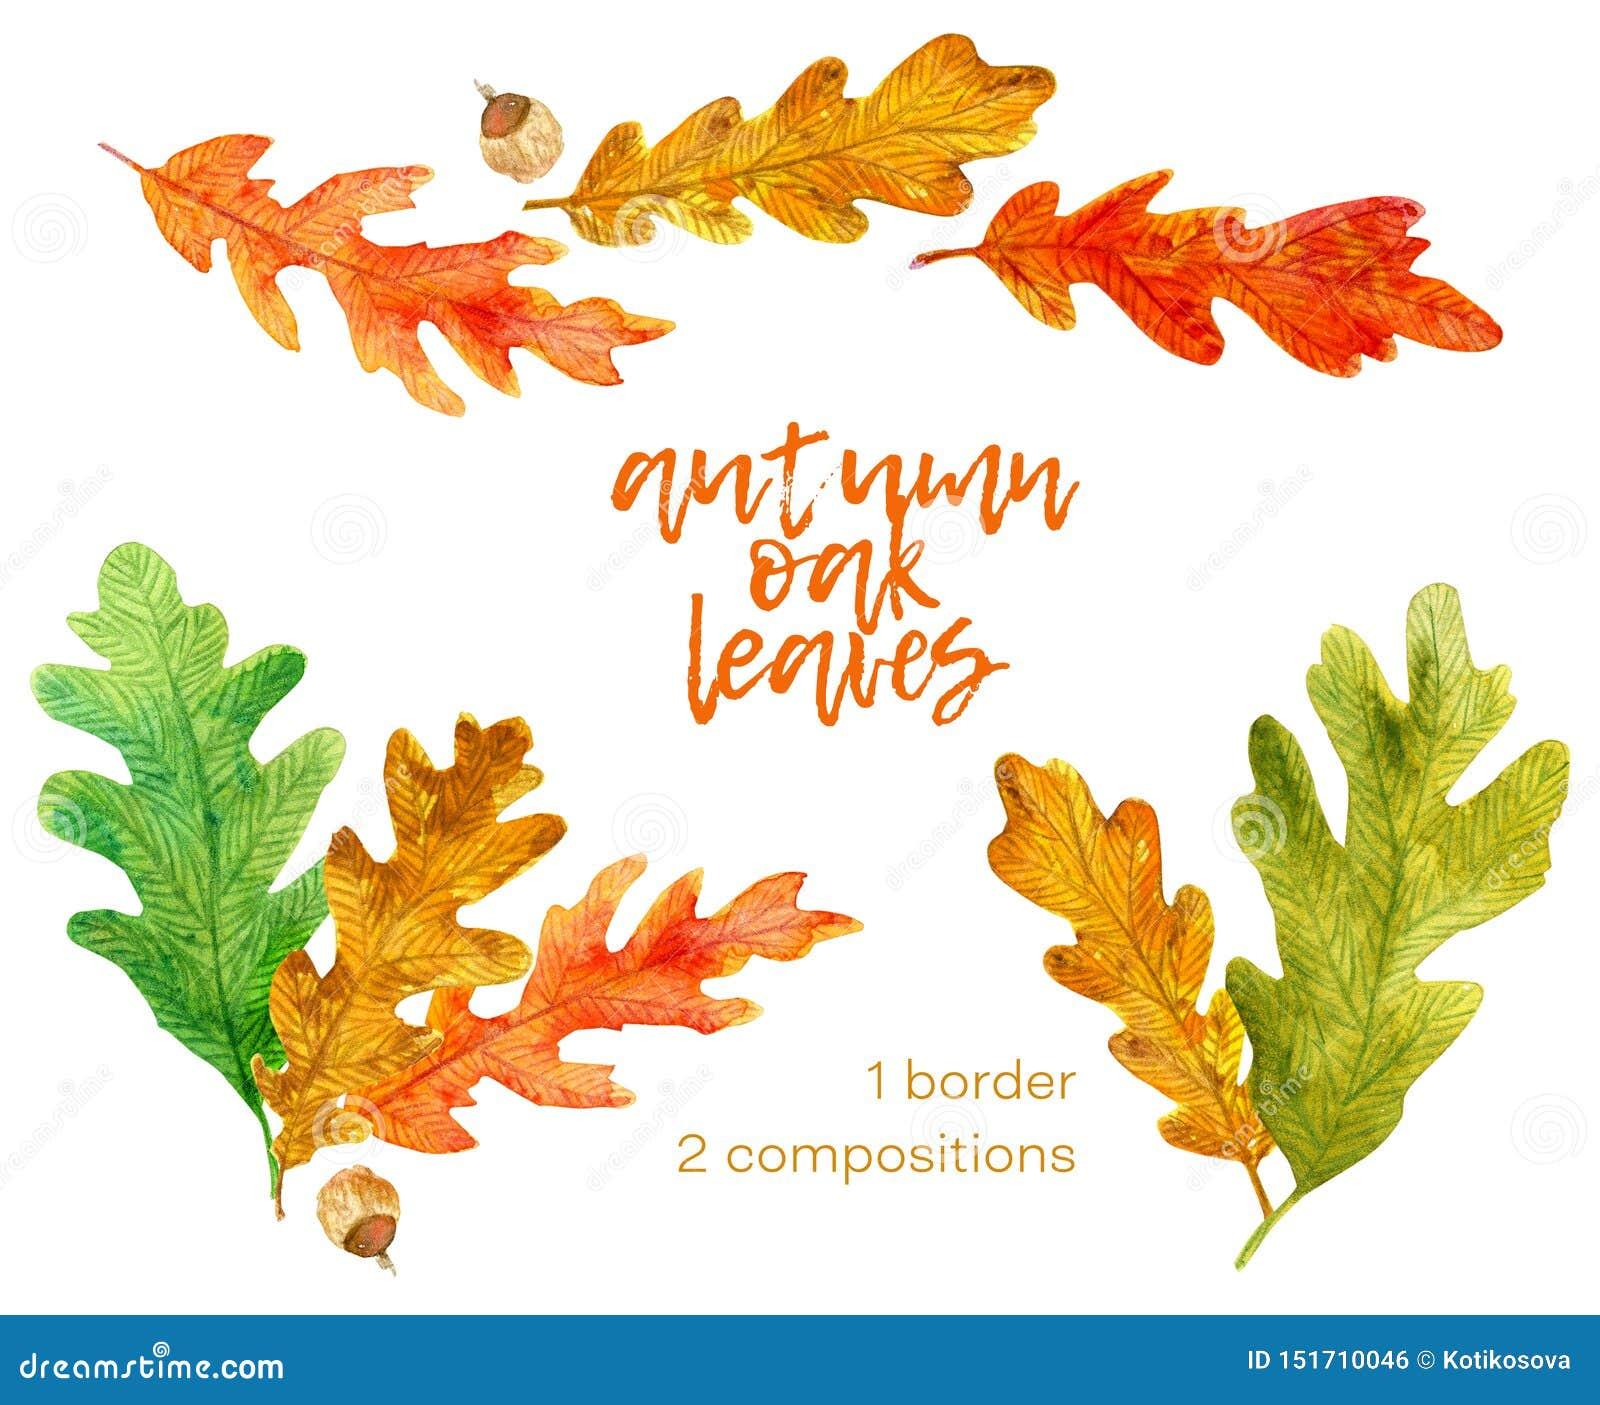 Set of hand drawn watercolor autumn oak leaves elements